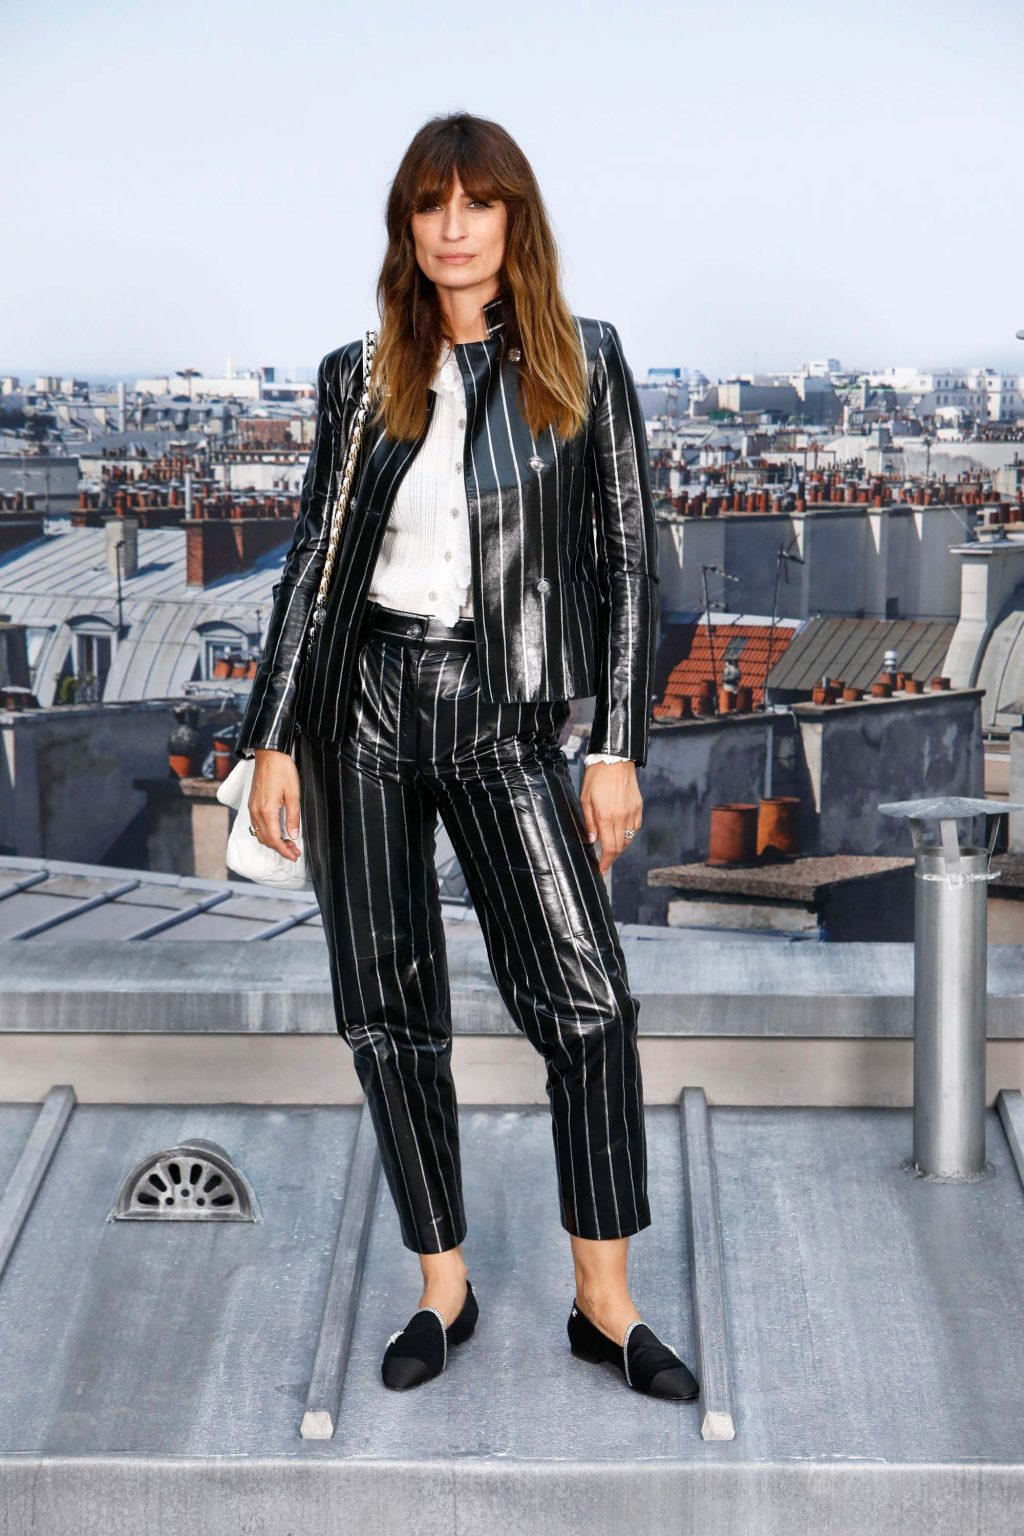 Caroline de Maigret tại show Chanel Xuân - Hè 2020 Tuần lễ thời trang Paris